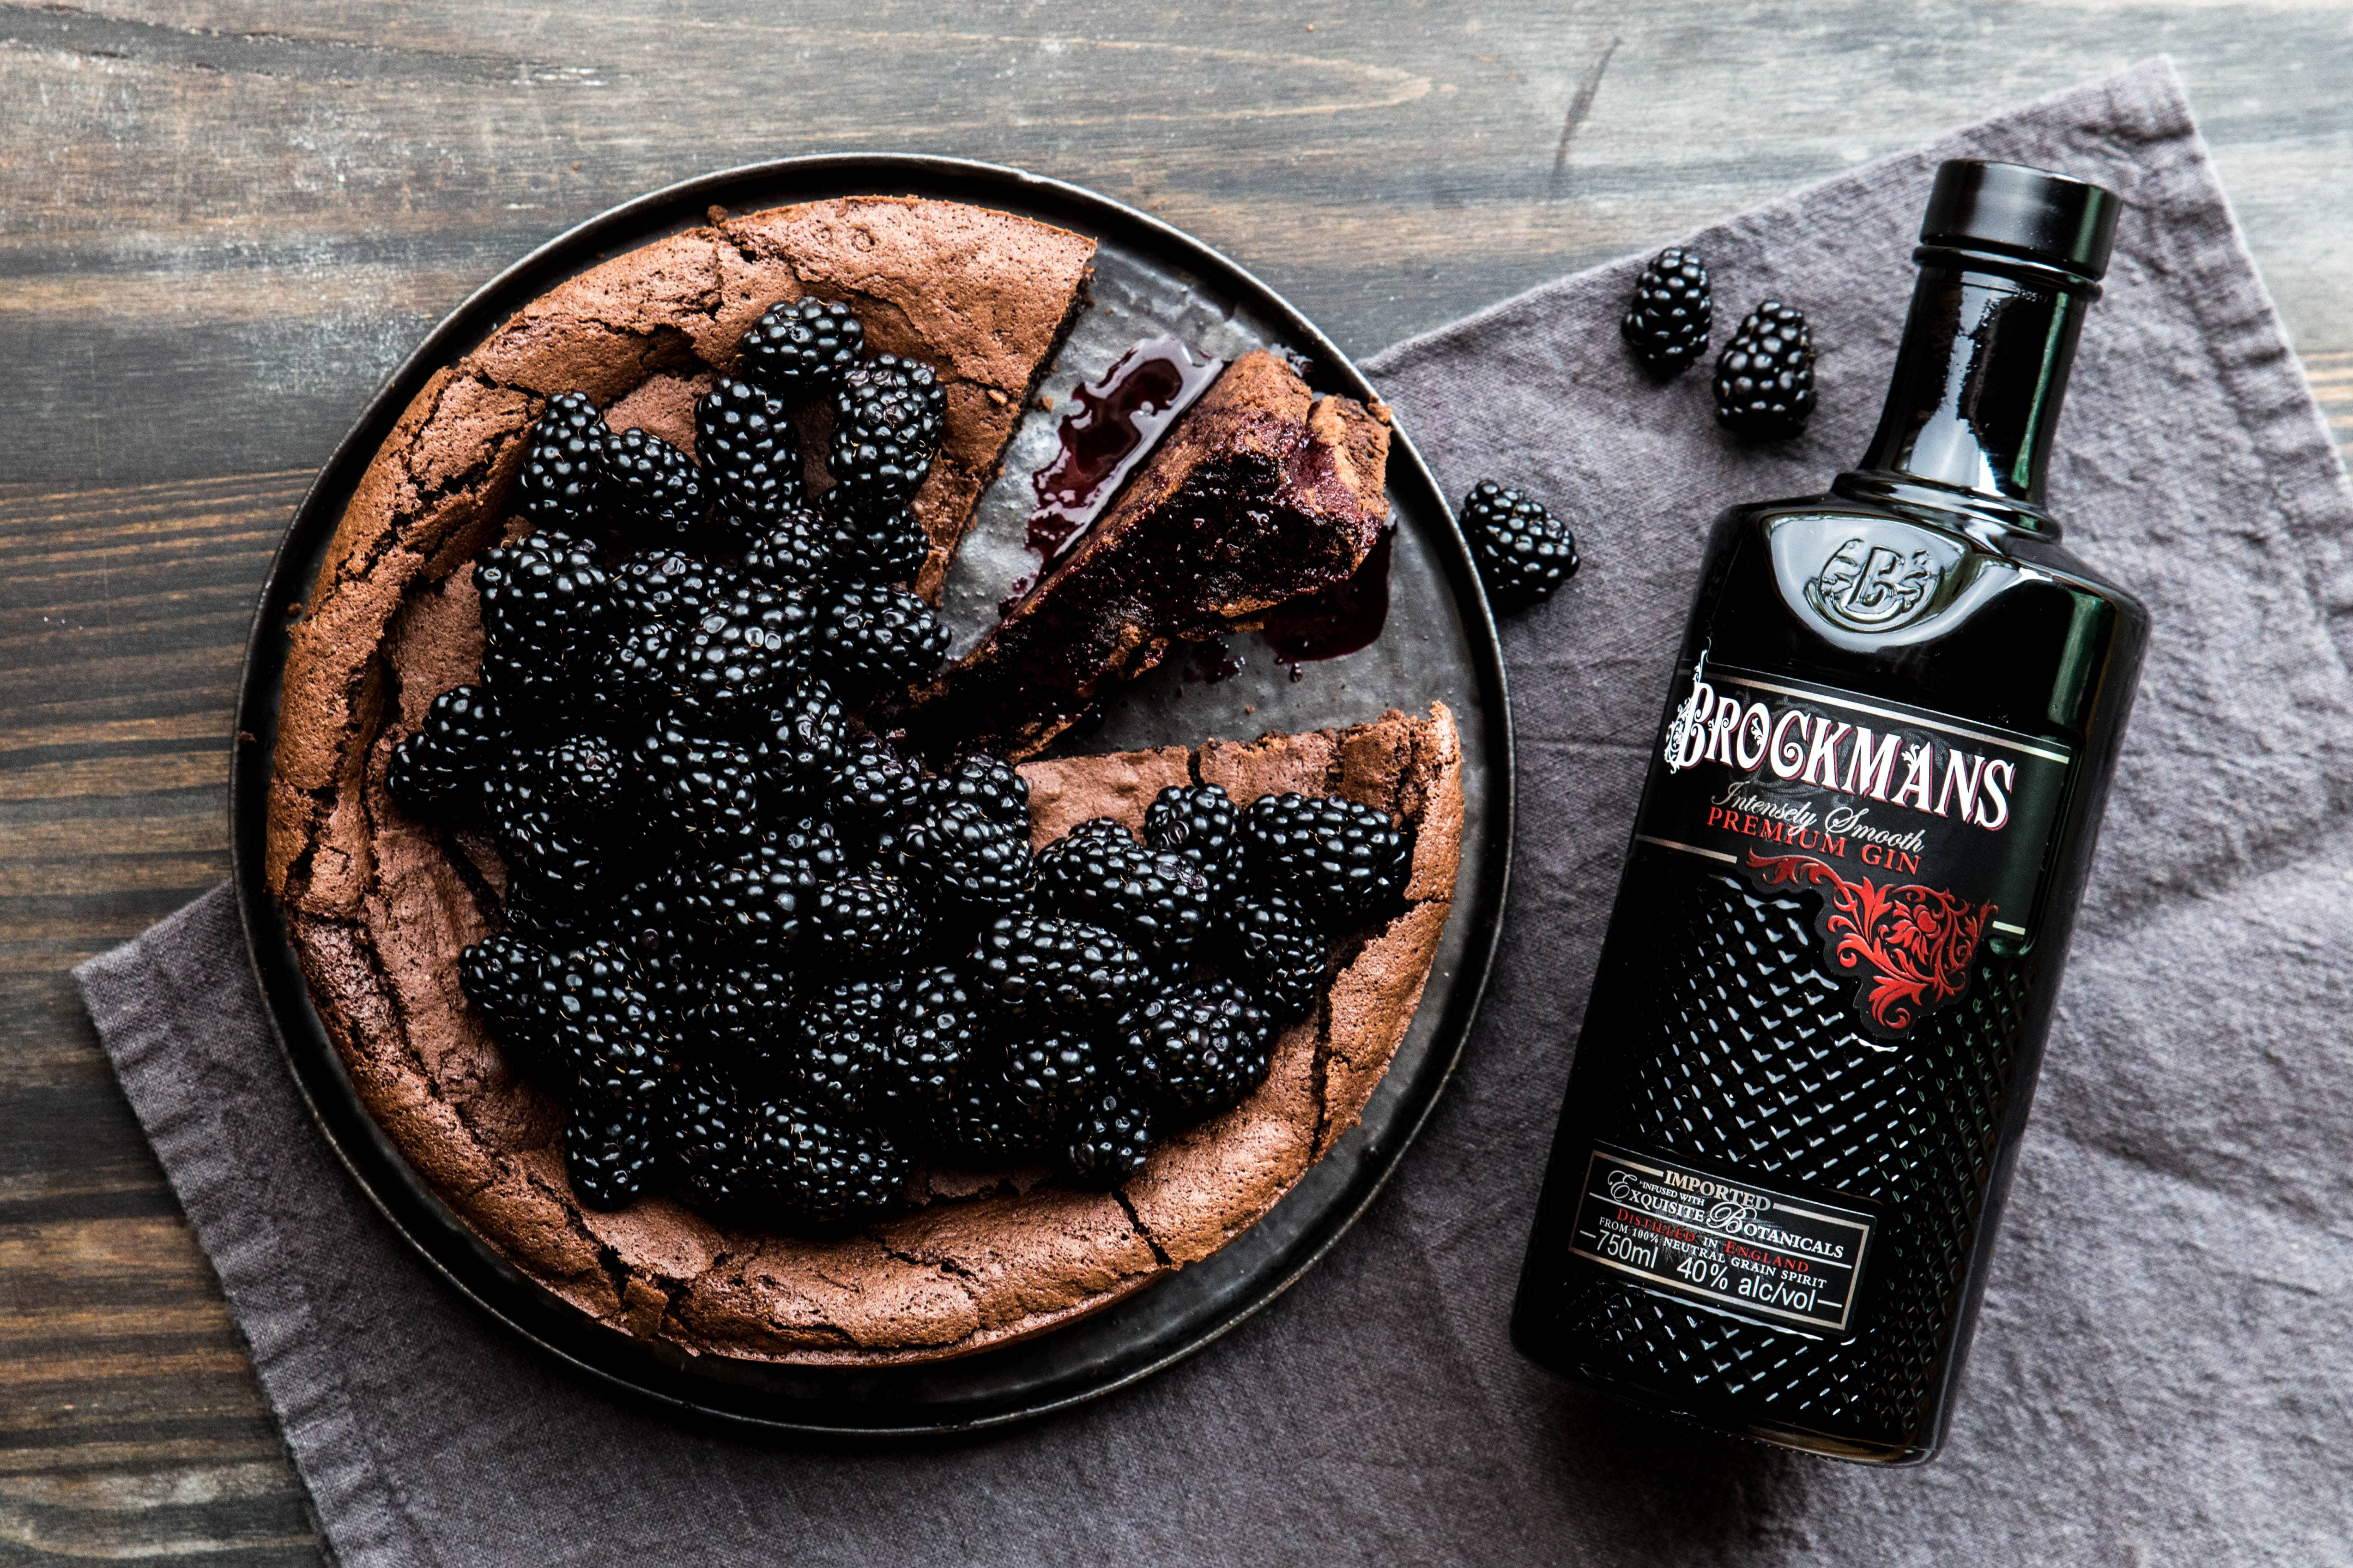 Chocolate Flourless Cake with Brockmans Berry Sauce